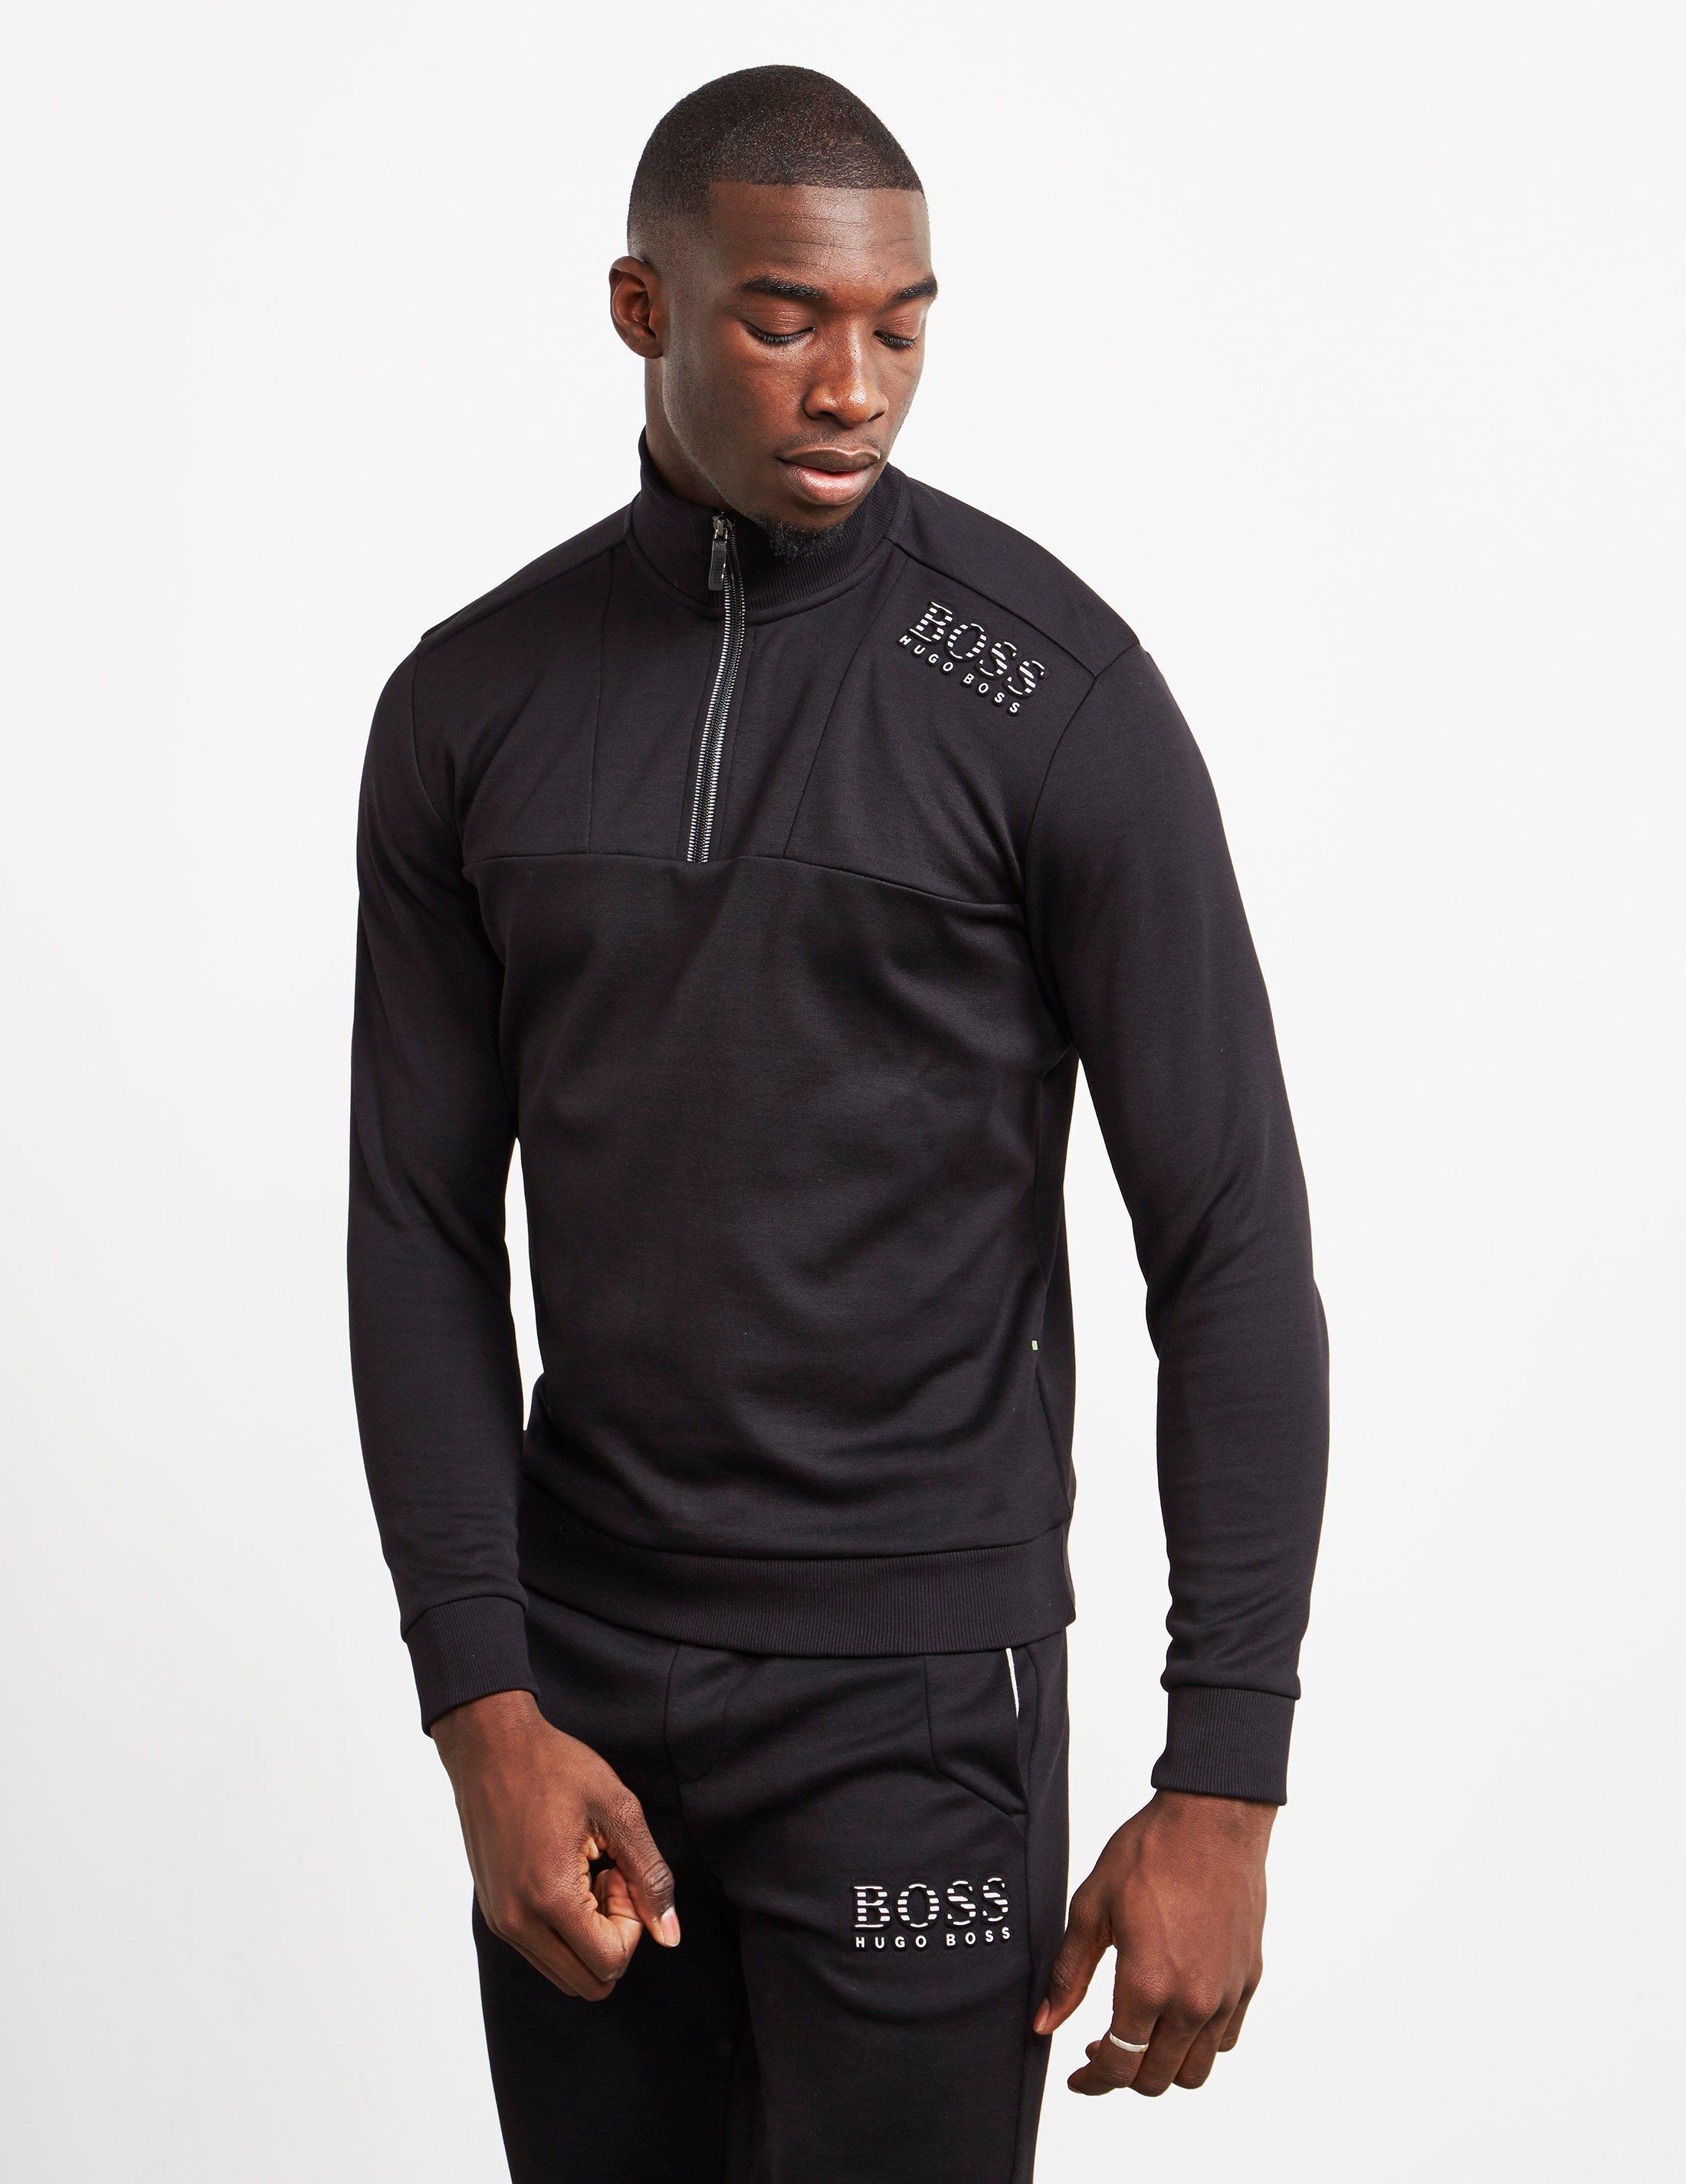 2e699ec7 BOSS - Mens Half Zip Sweatshirt Black for Men - Lyst. View fullscreen